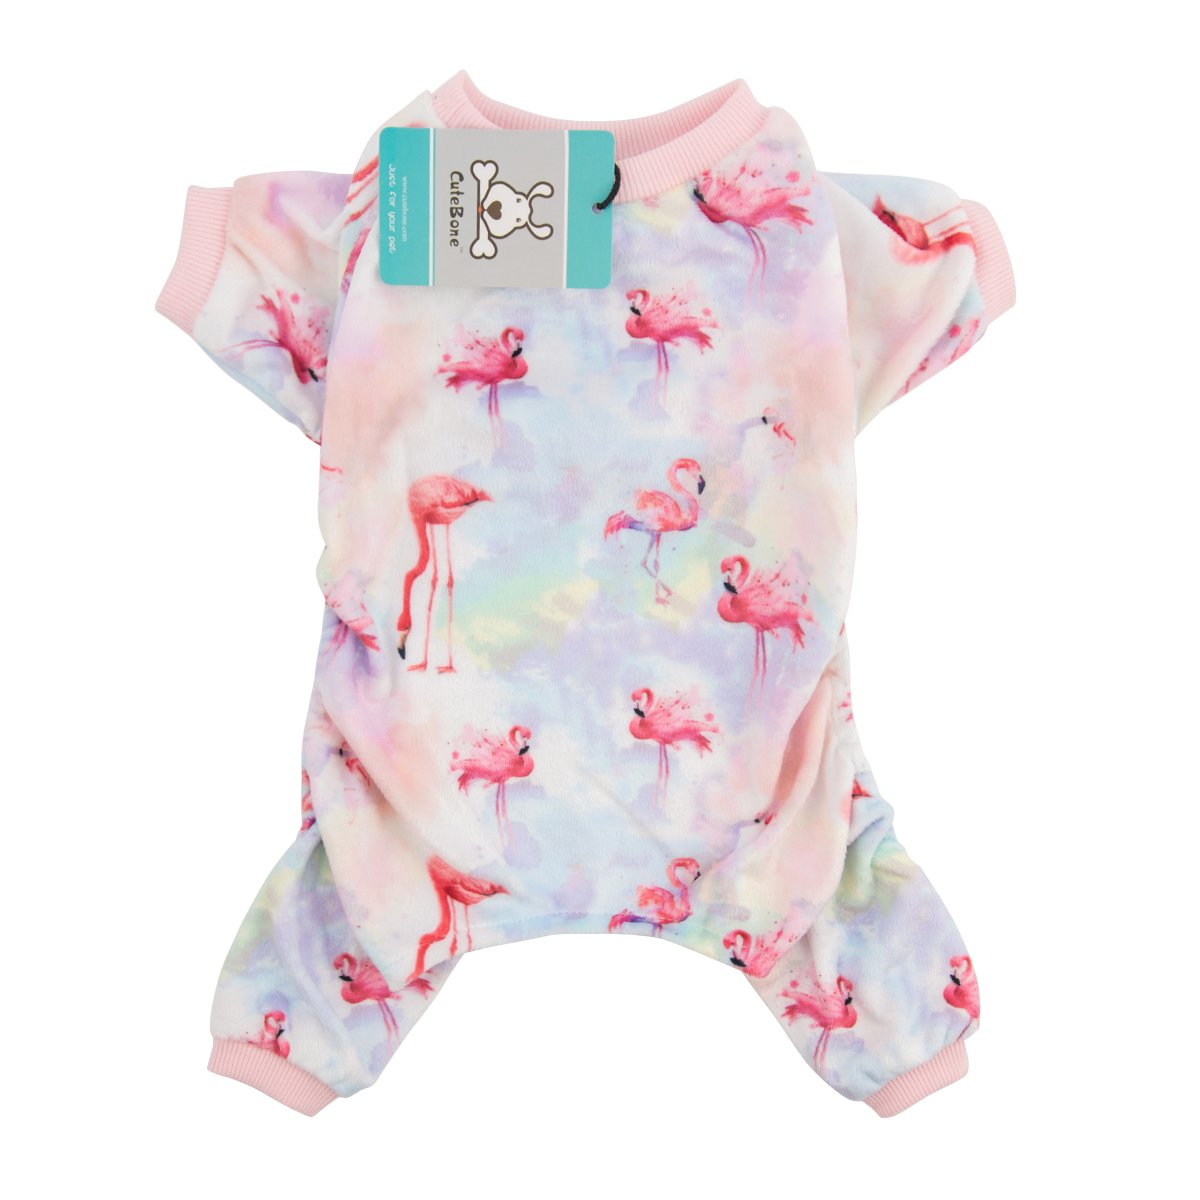 CuteBone Dog Pajamas Flamingo Dog Apparel Dog Jumpsuit Pet Clothes Pajamas Puppy Clothes P44L